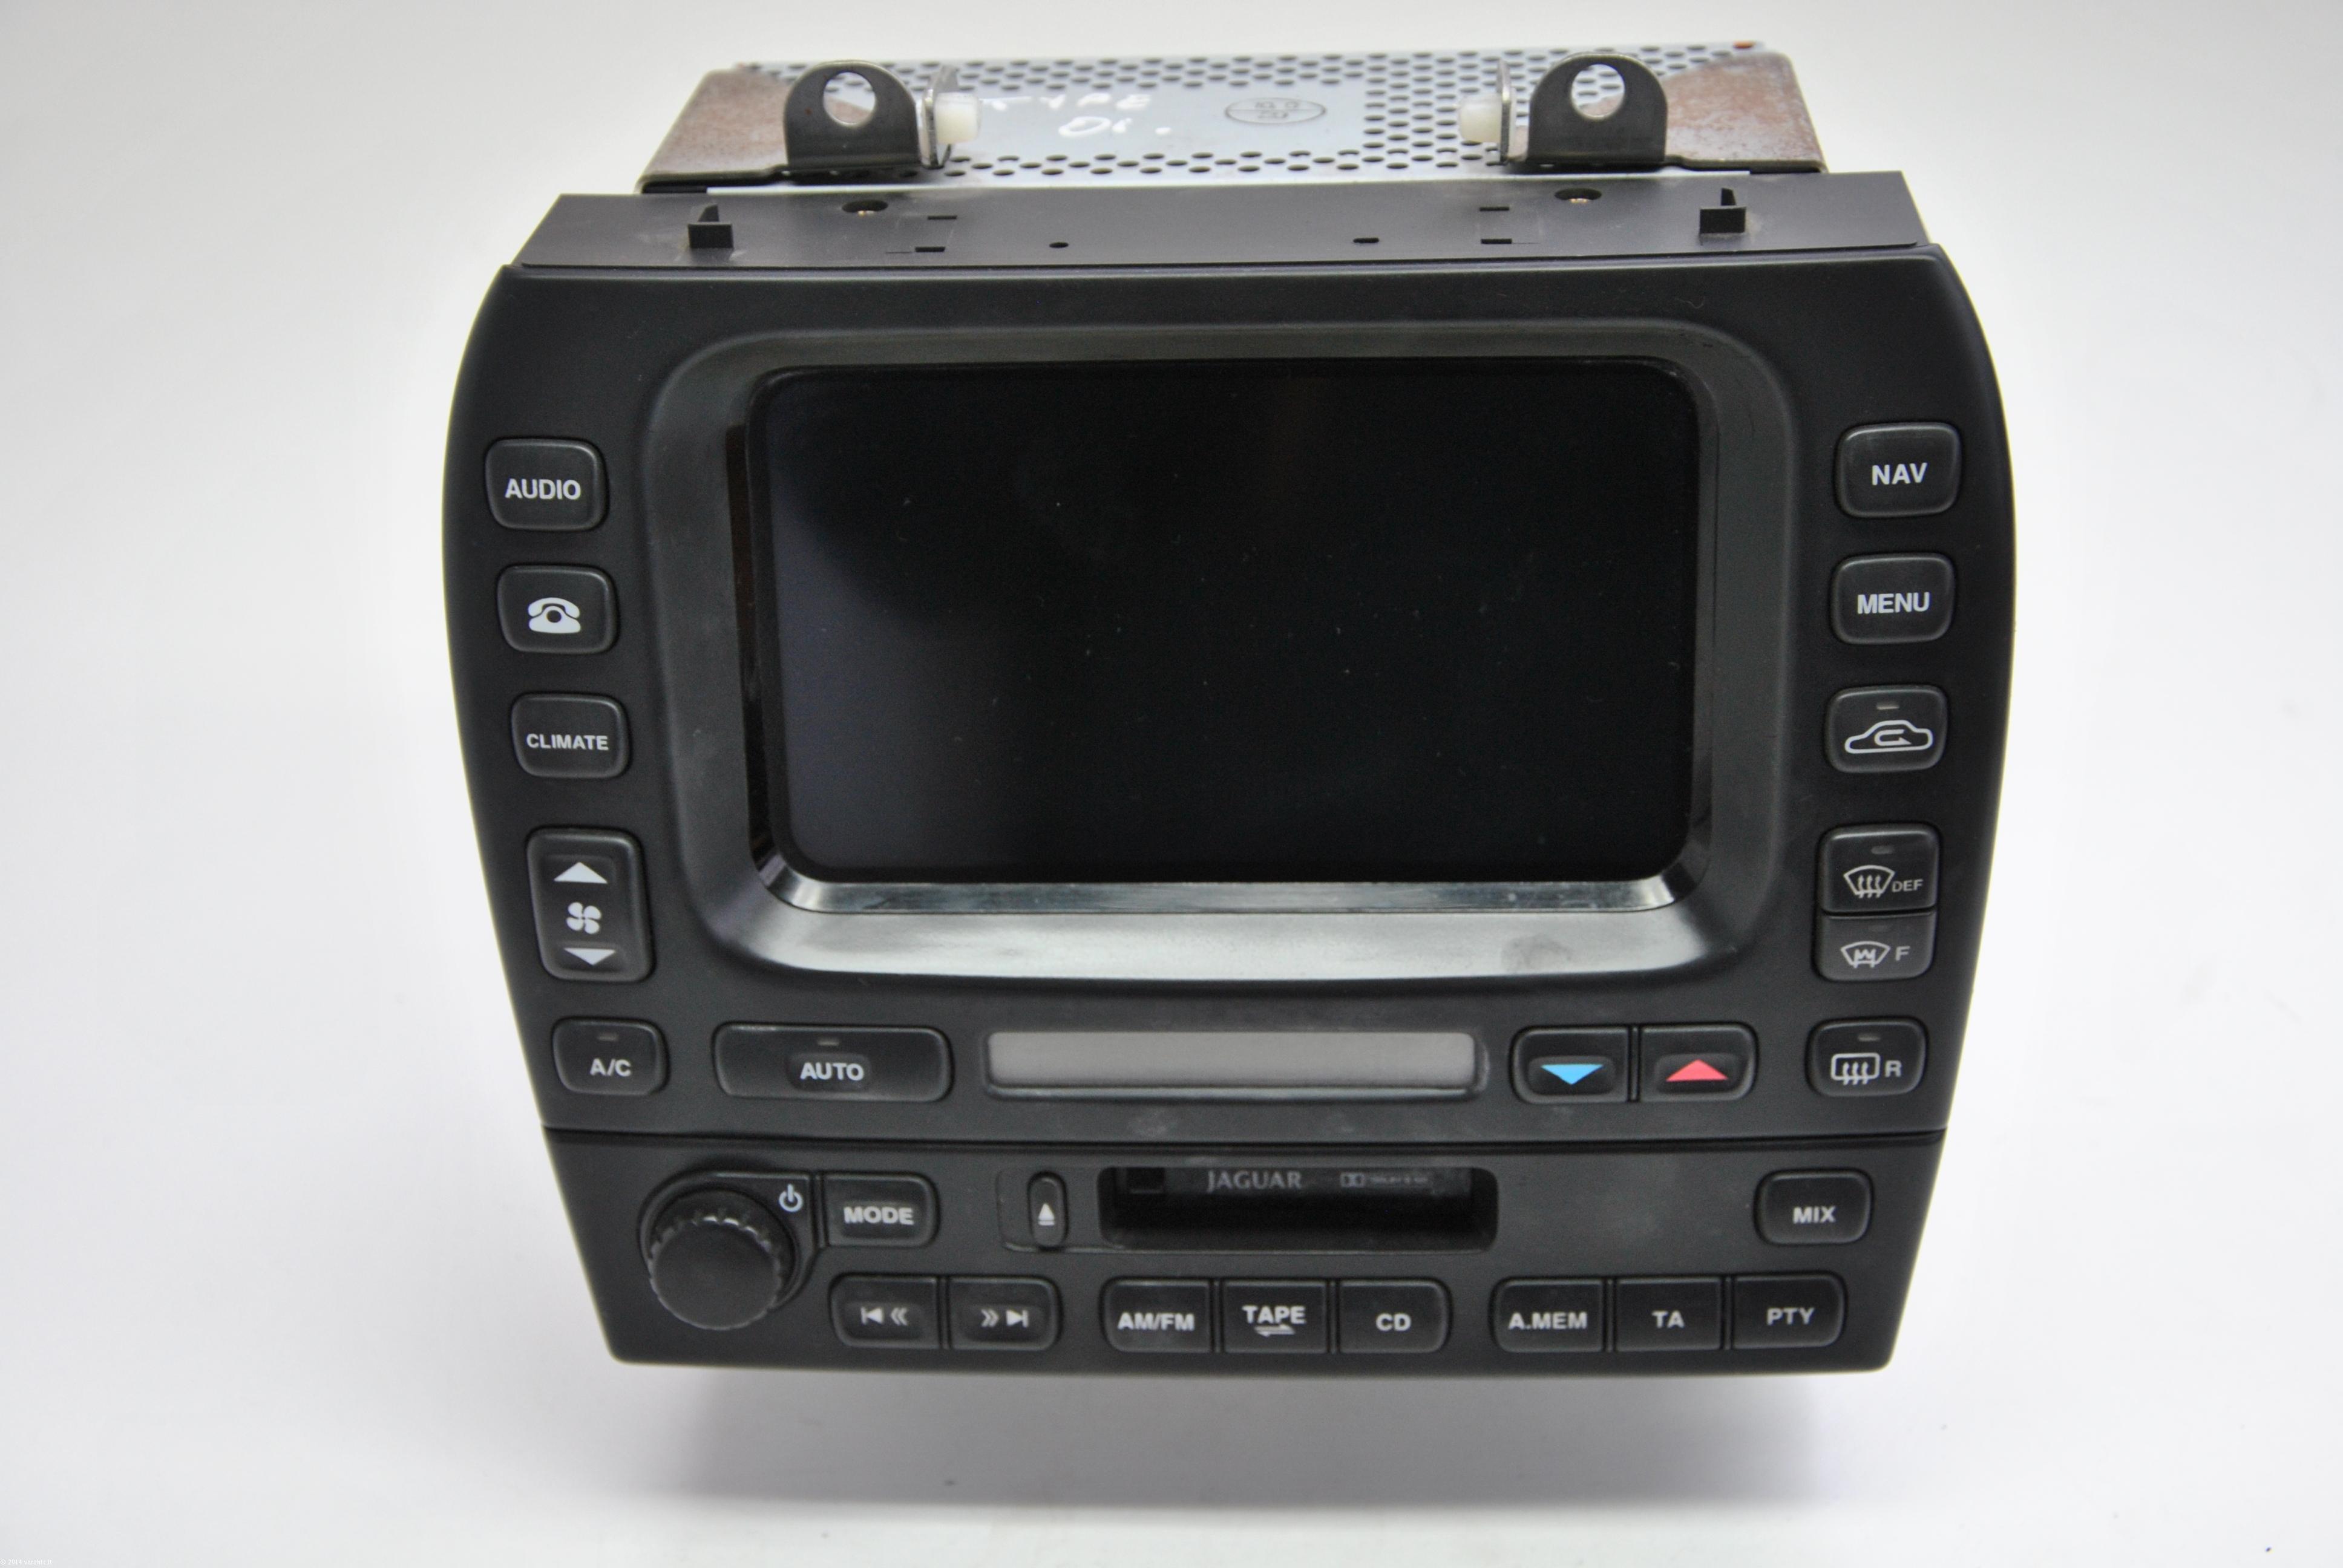 jaguar x type 2001 music player with navigation system 1x4310e889be 462200 5143 ebay. Black Bedroom Furniture Sets. Home Design Ideas